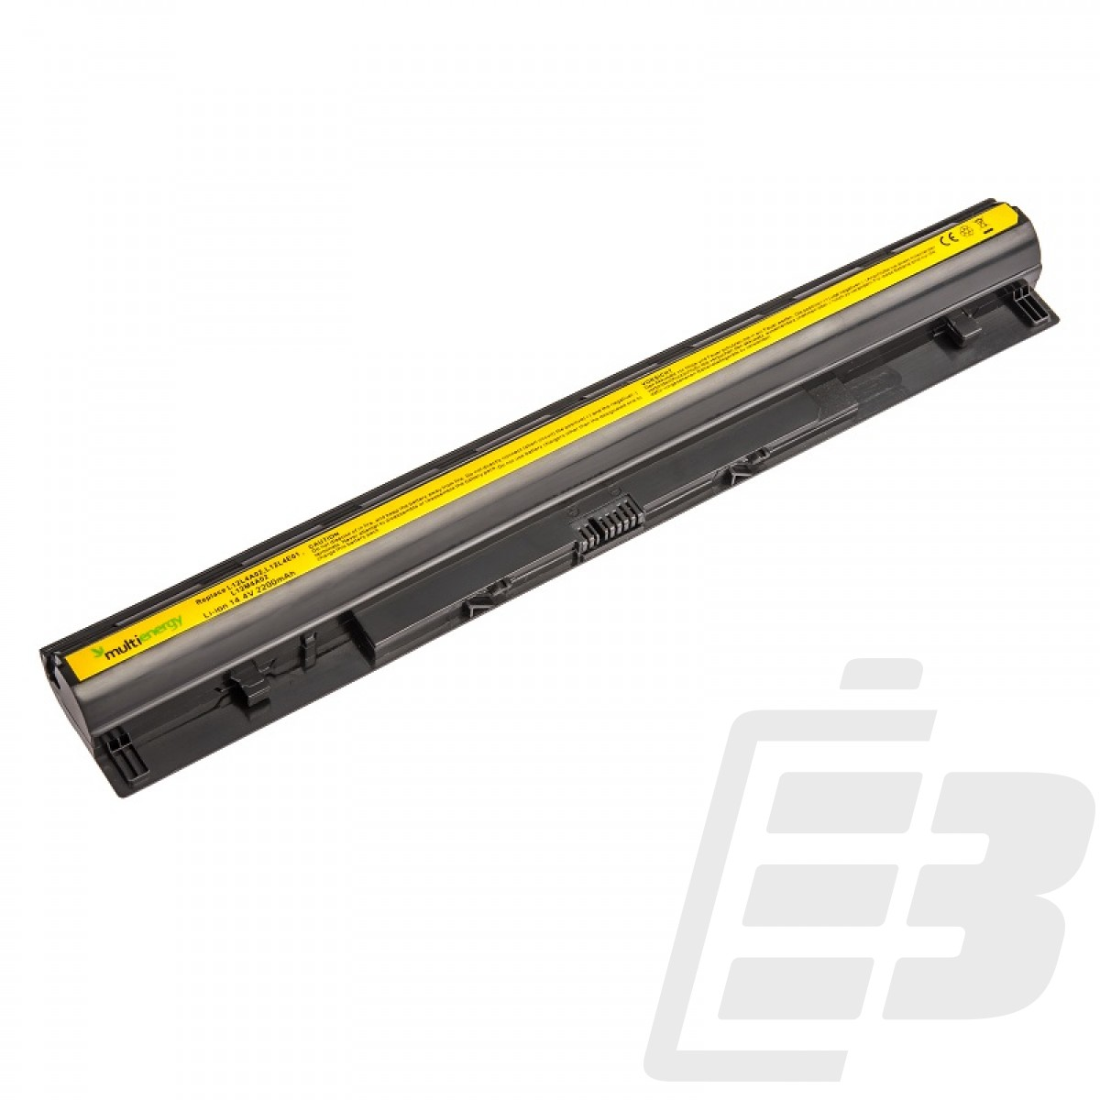 Laptop battery Lenovo IdeaPad G500_1